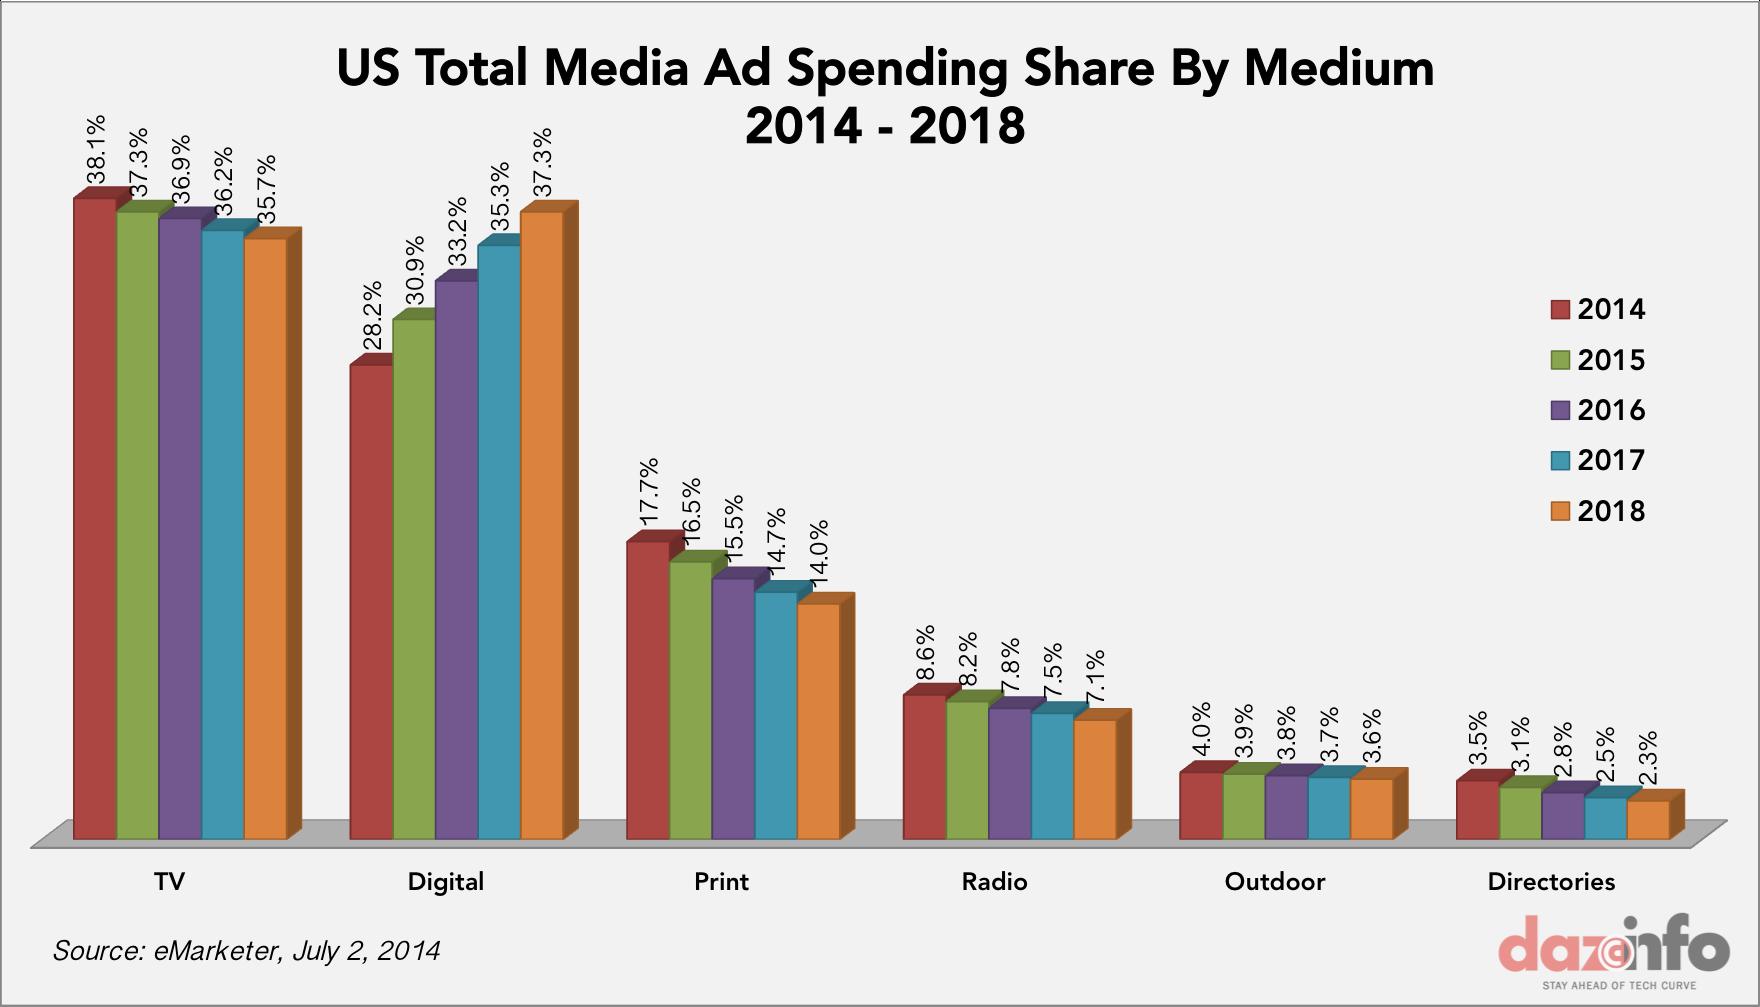 Ad spending in US 2014 - 2018